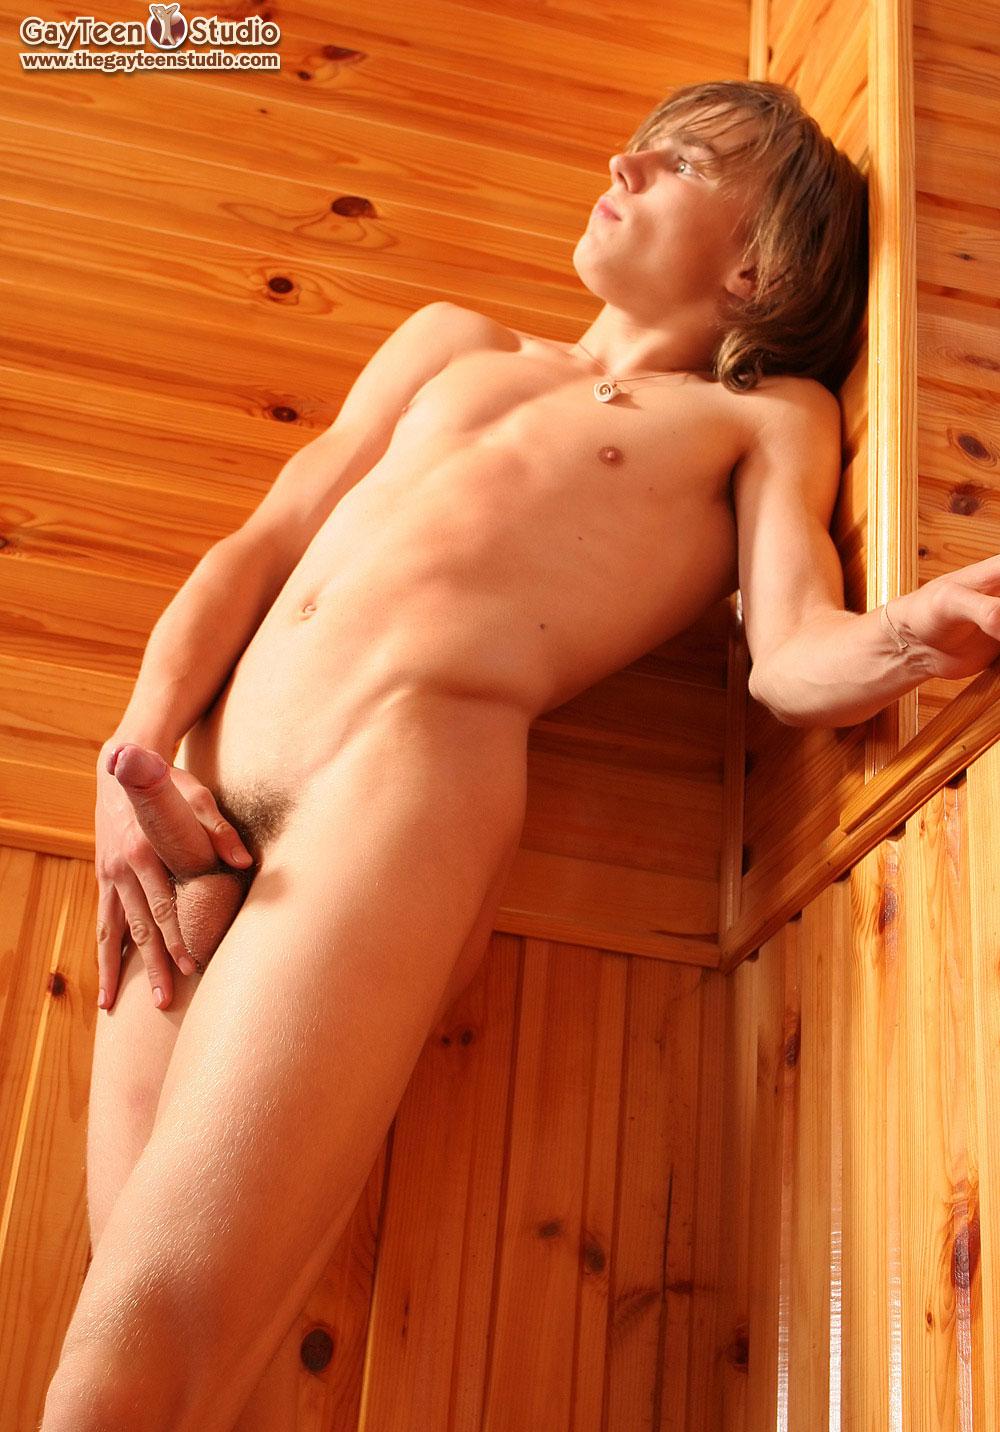 Sexy naked women boobs